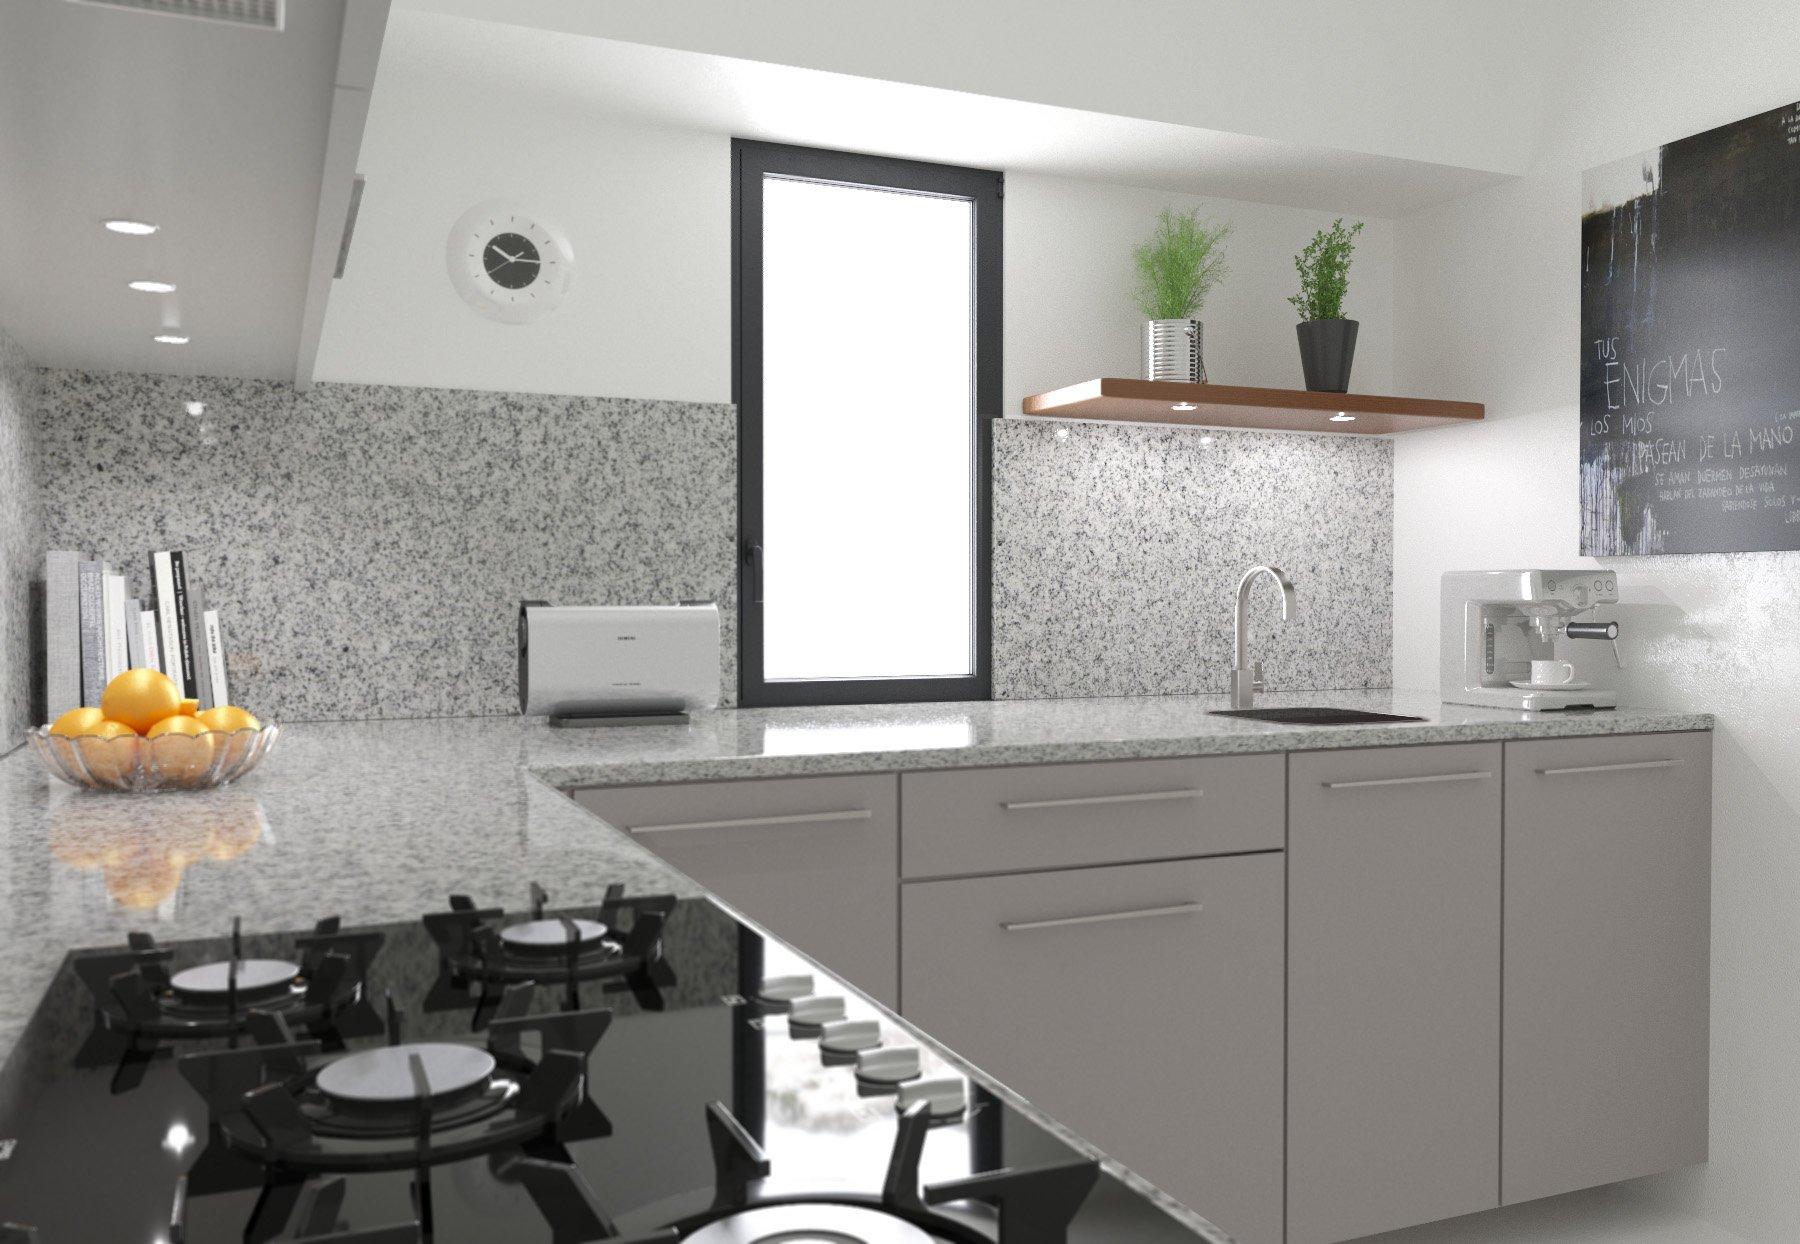 rendering cucina 2  Cucina da foto reference rendering cucina 2